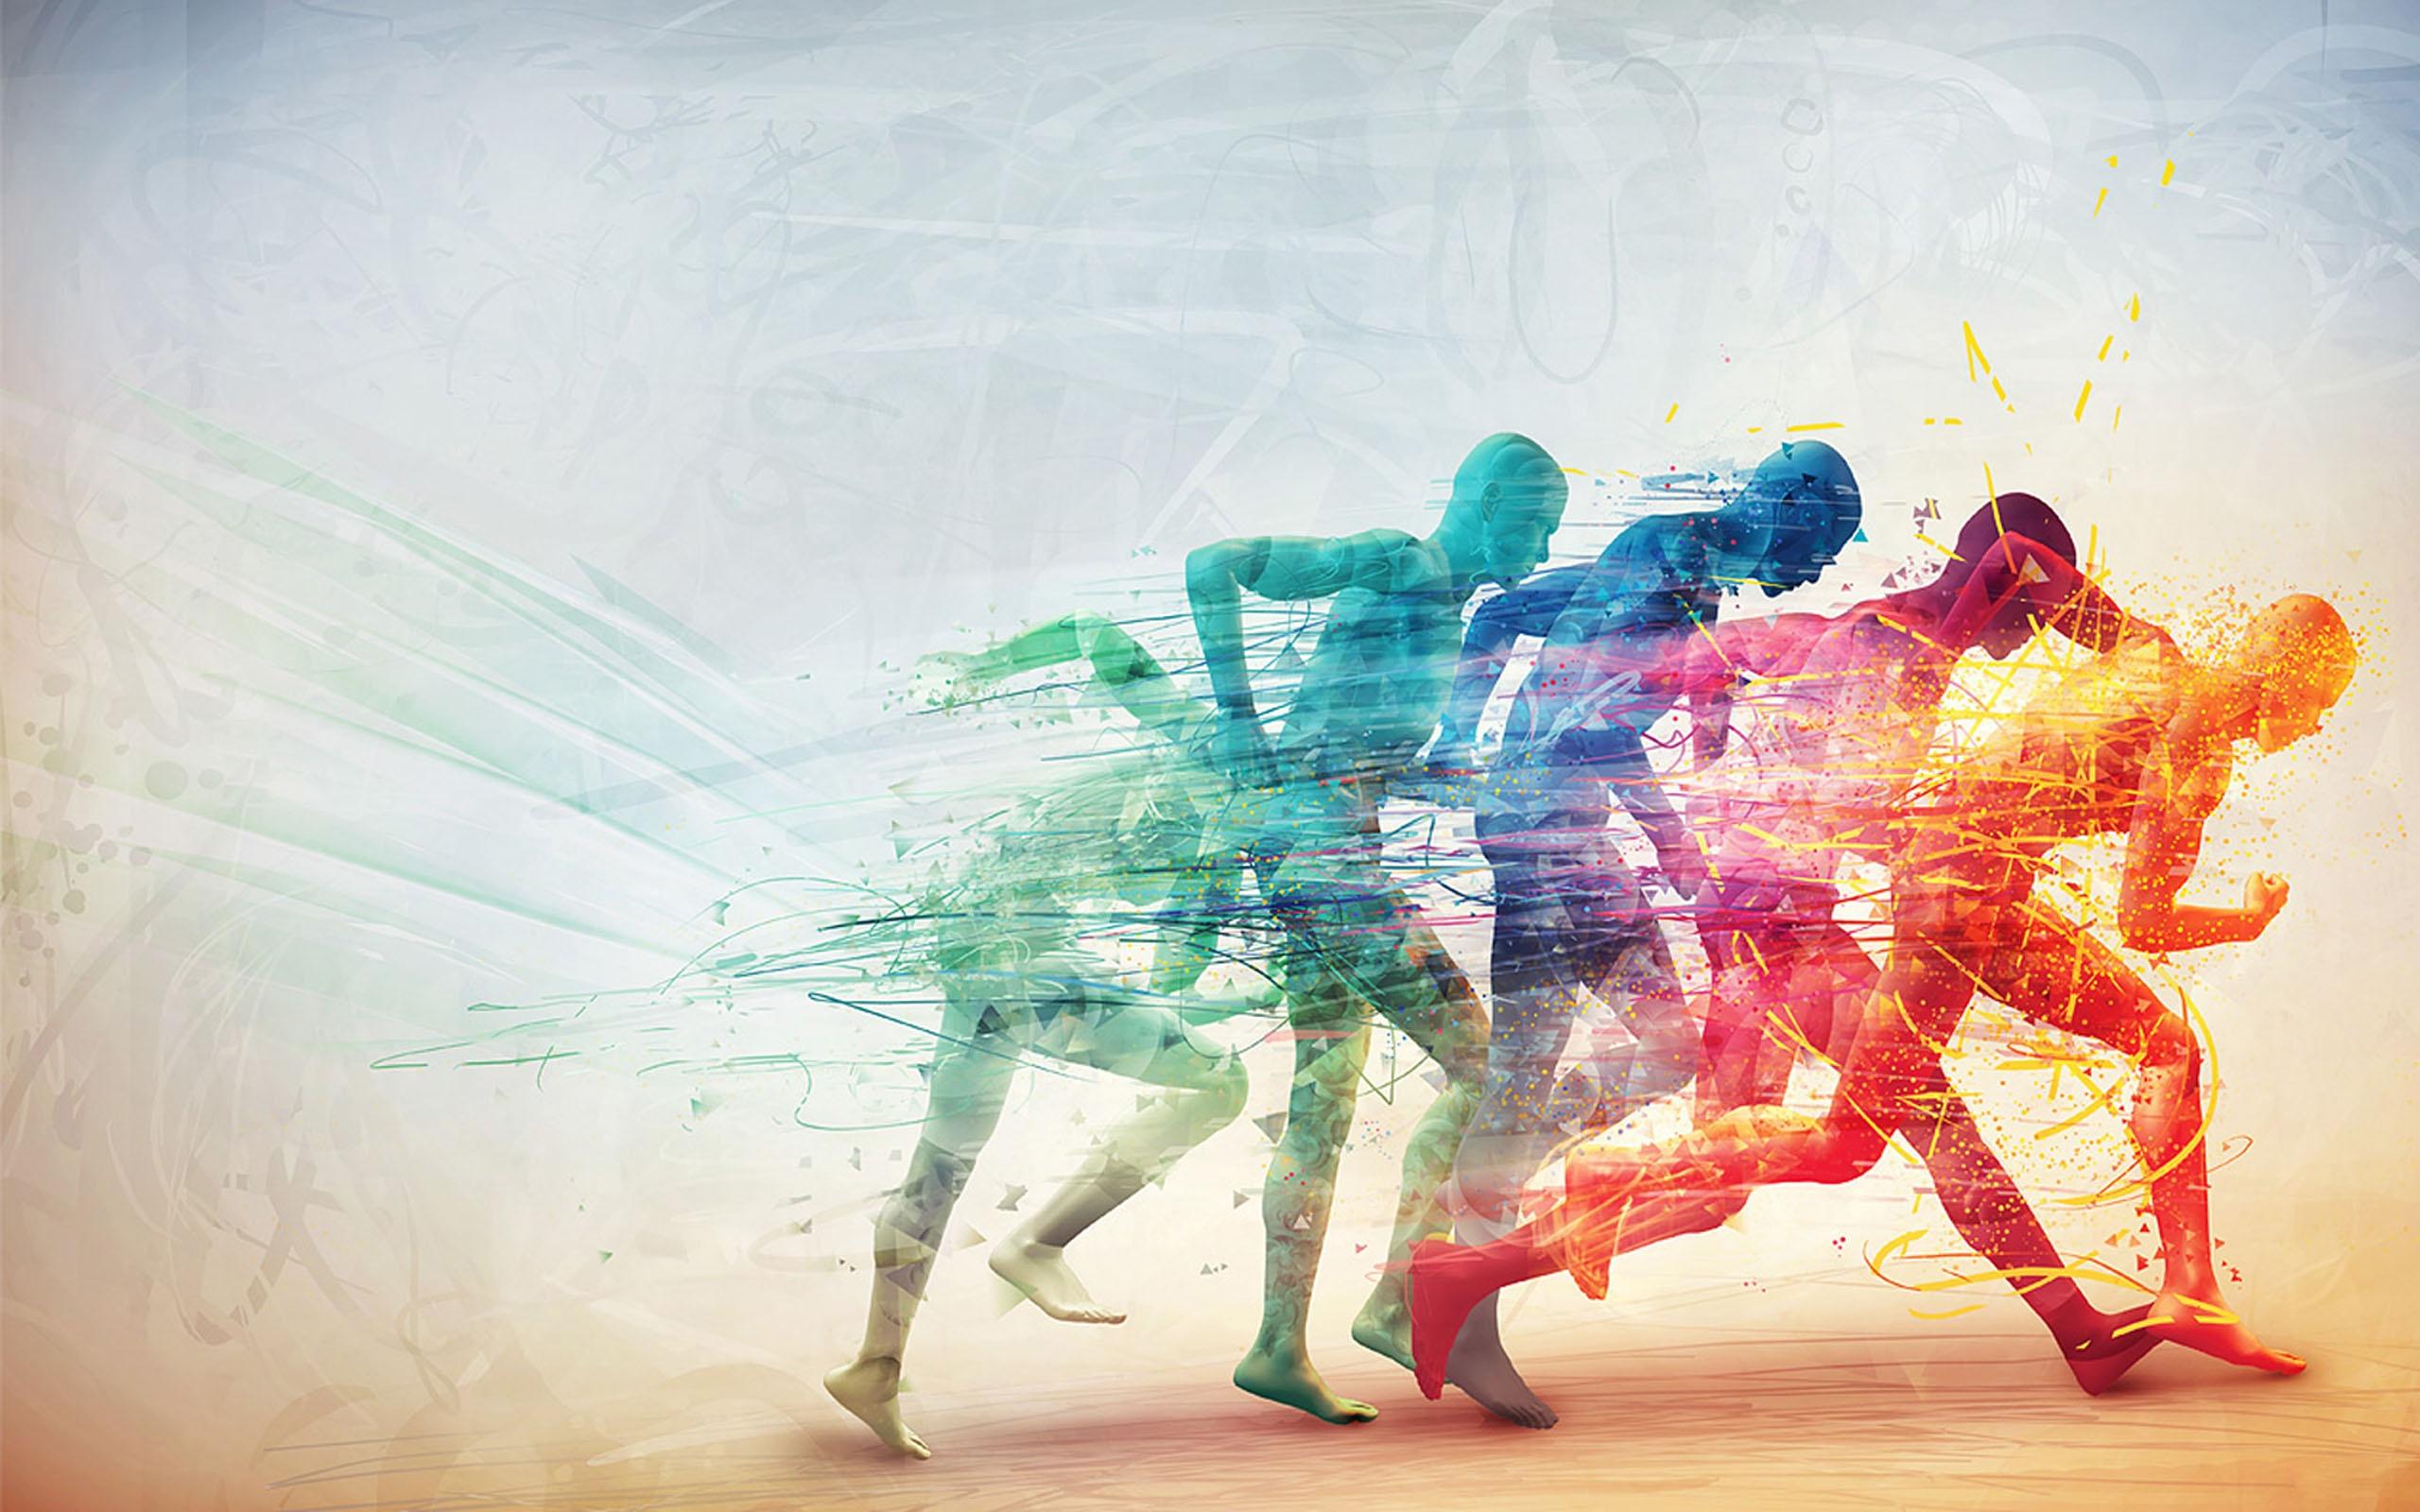 HQ Outdoor Running Vs Treadmill 2560x1600 Wallpaper   HQ 2560x1600